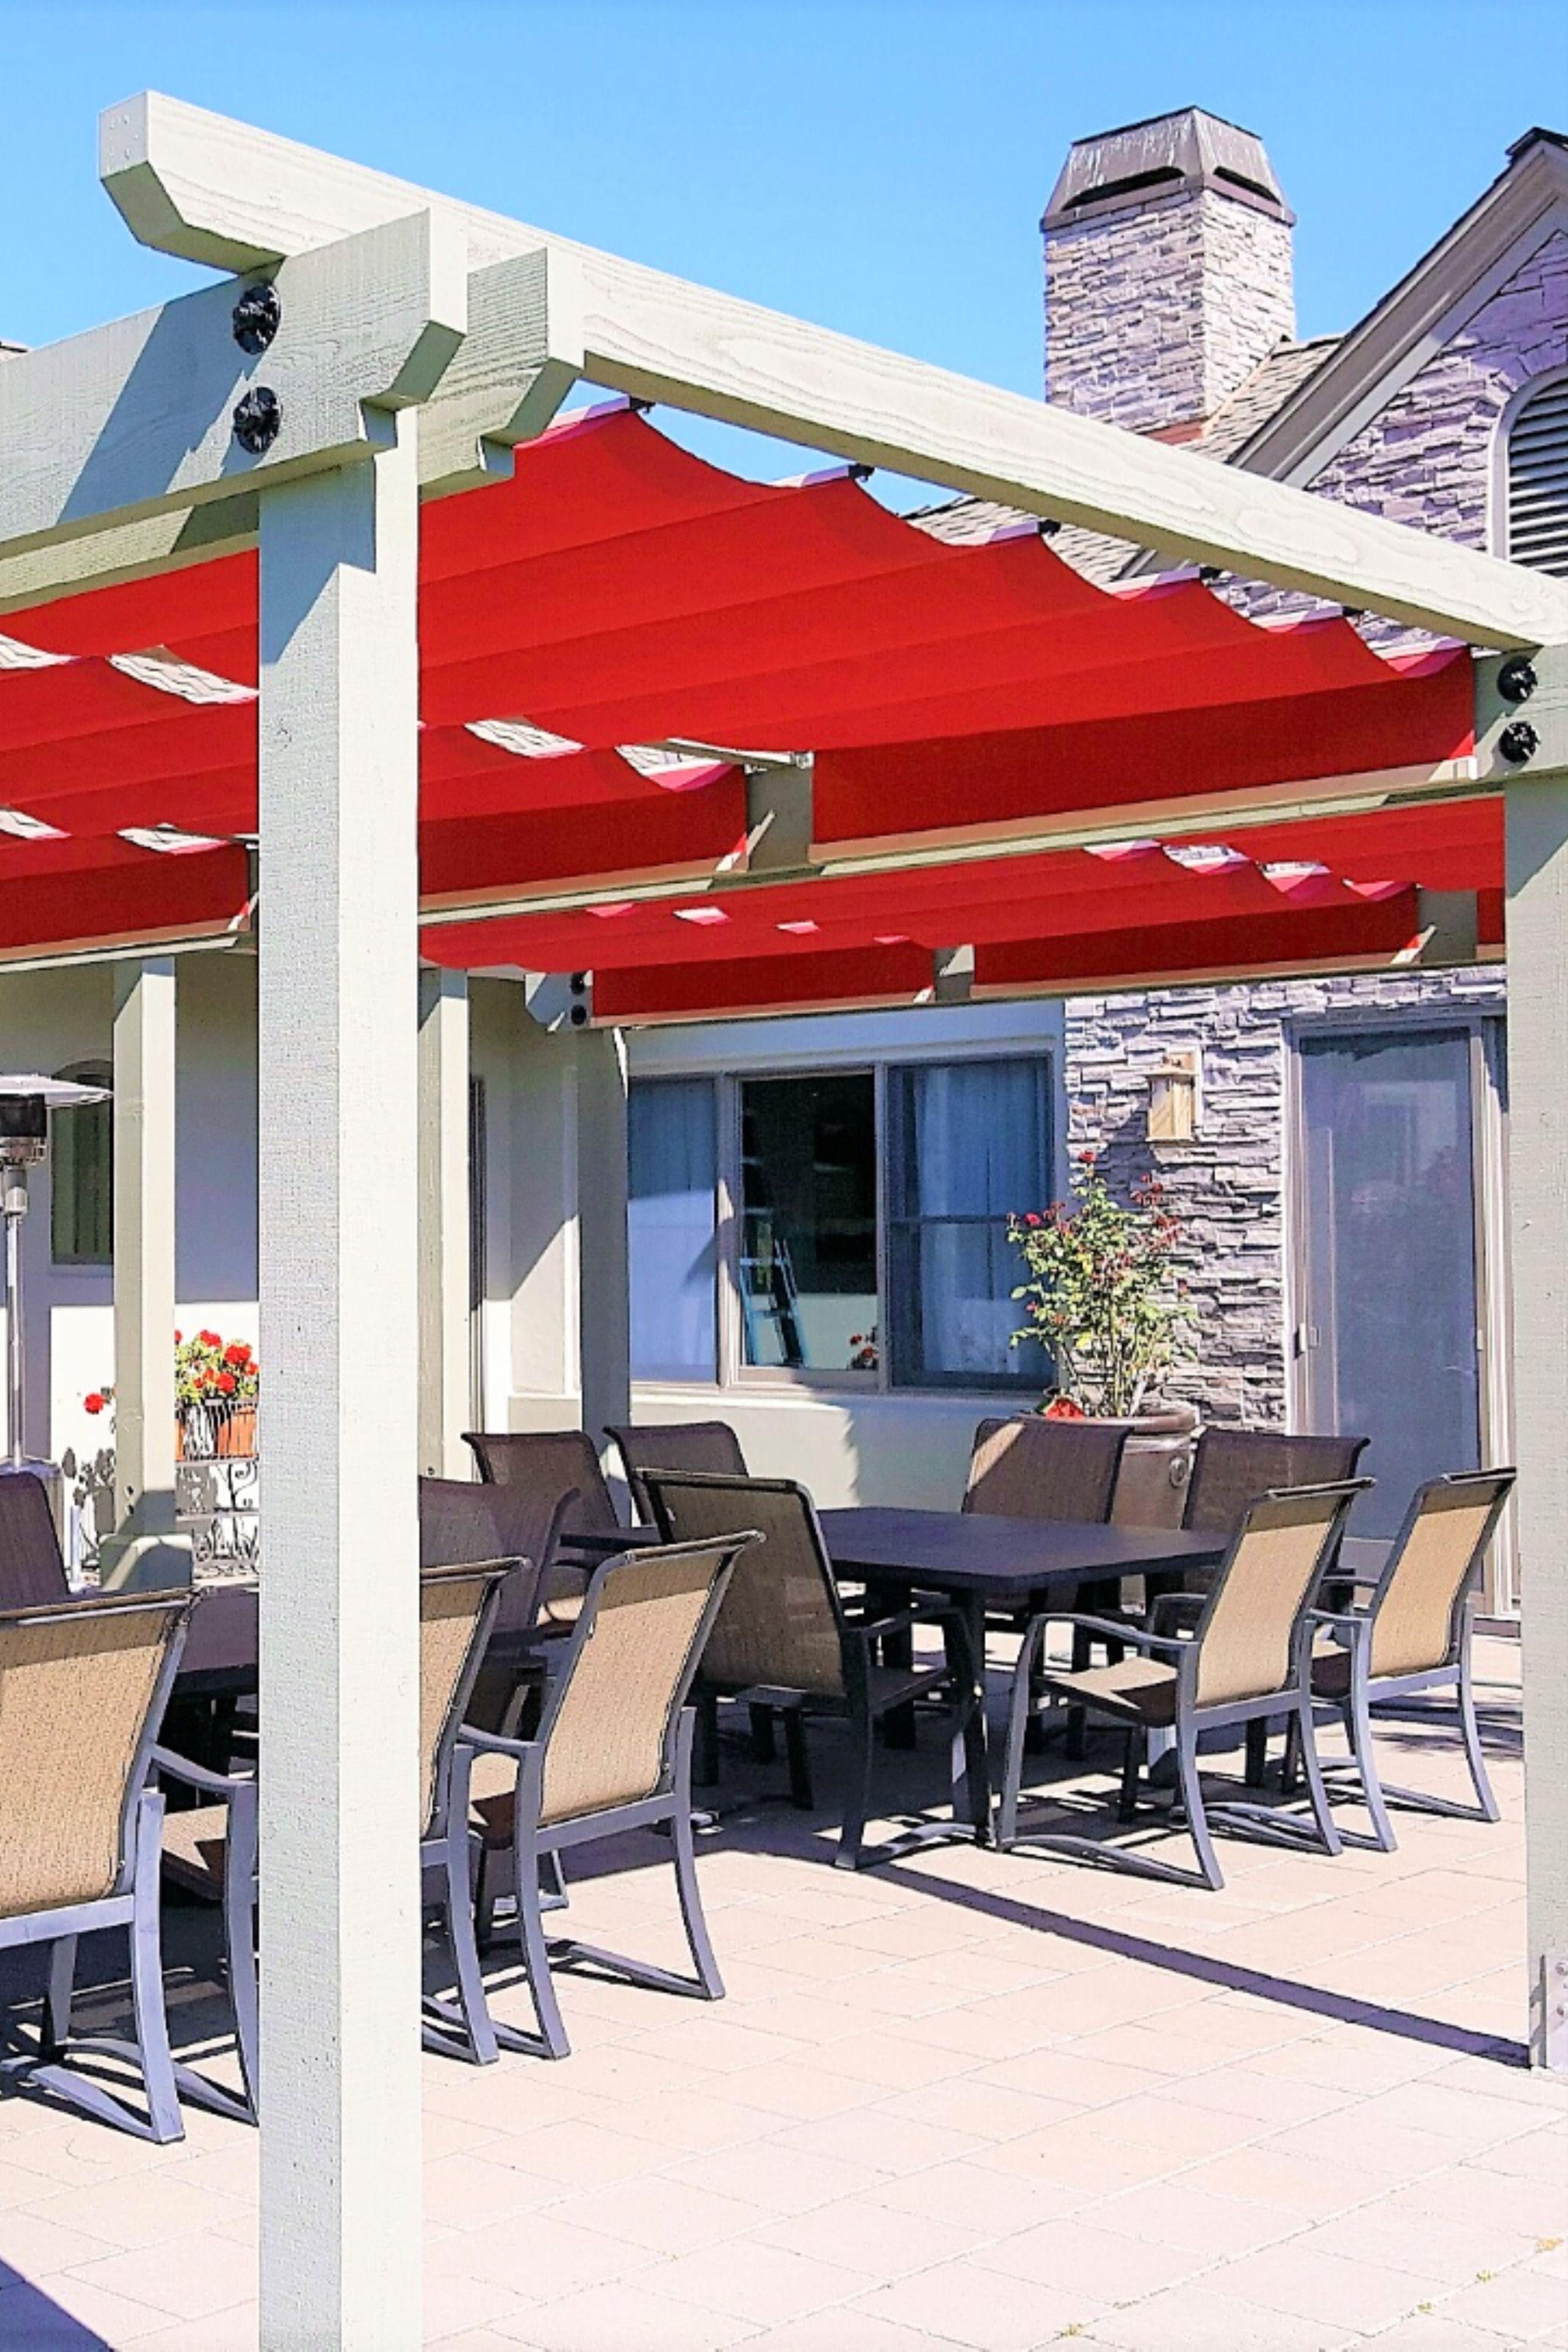 pergola shade canopy on red fabric shades over patio set patio patio shade patio set red fabric shades over patio set